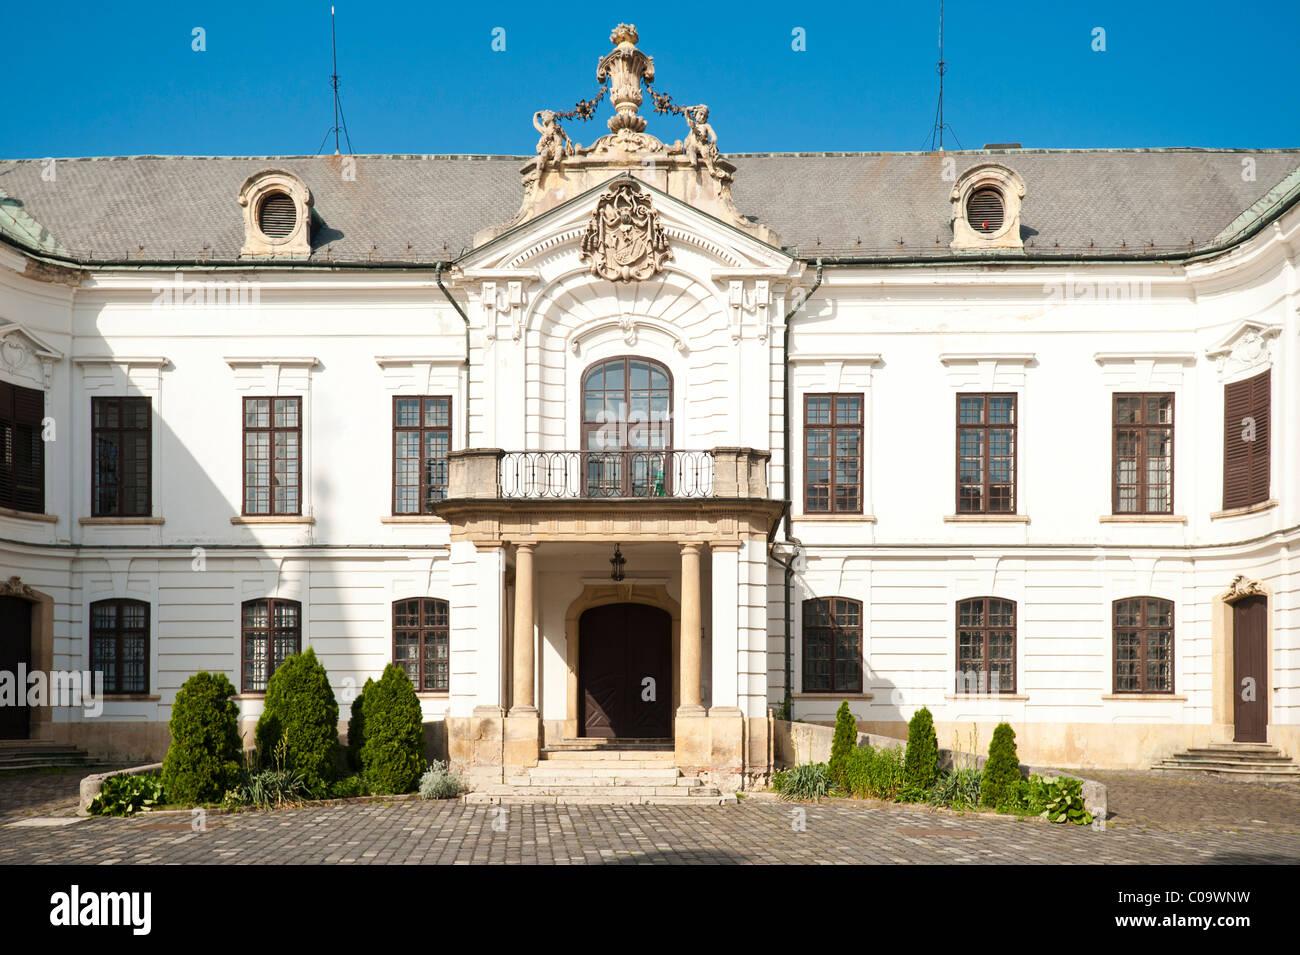 Archbishop's Palace, Veszprem, Weissbrunn, Hungary, Europe - Stock Image